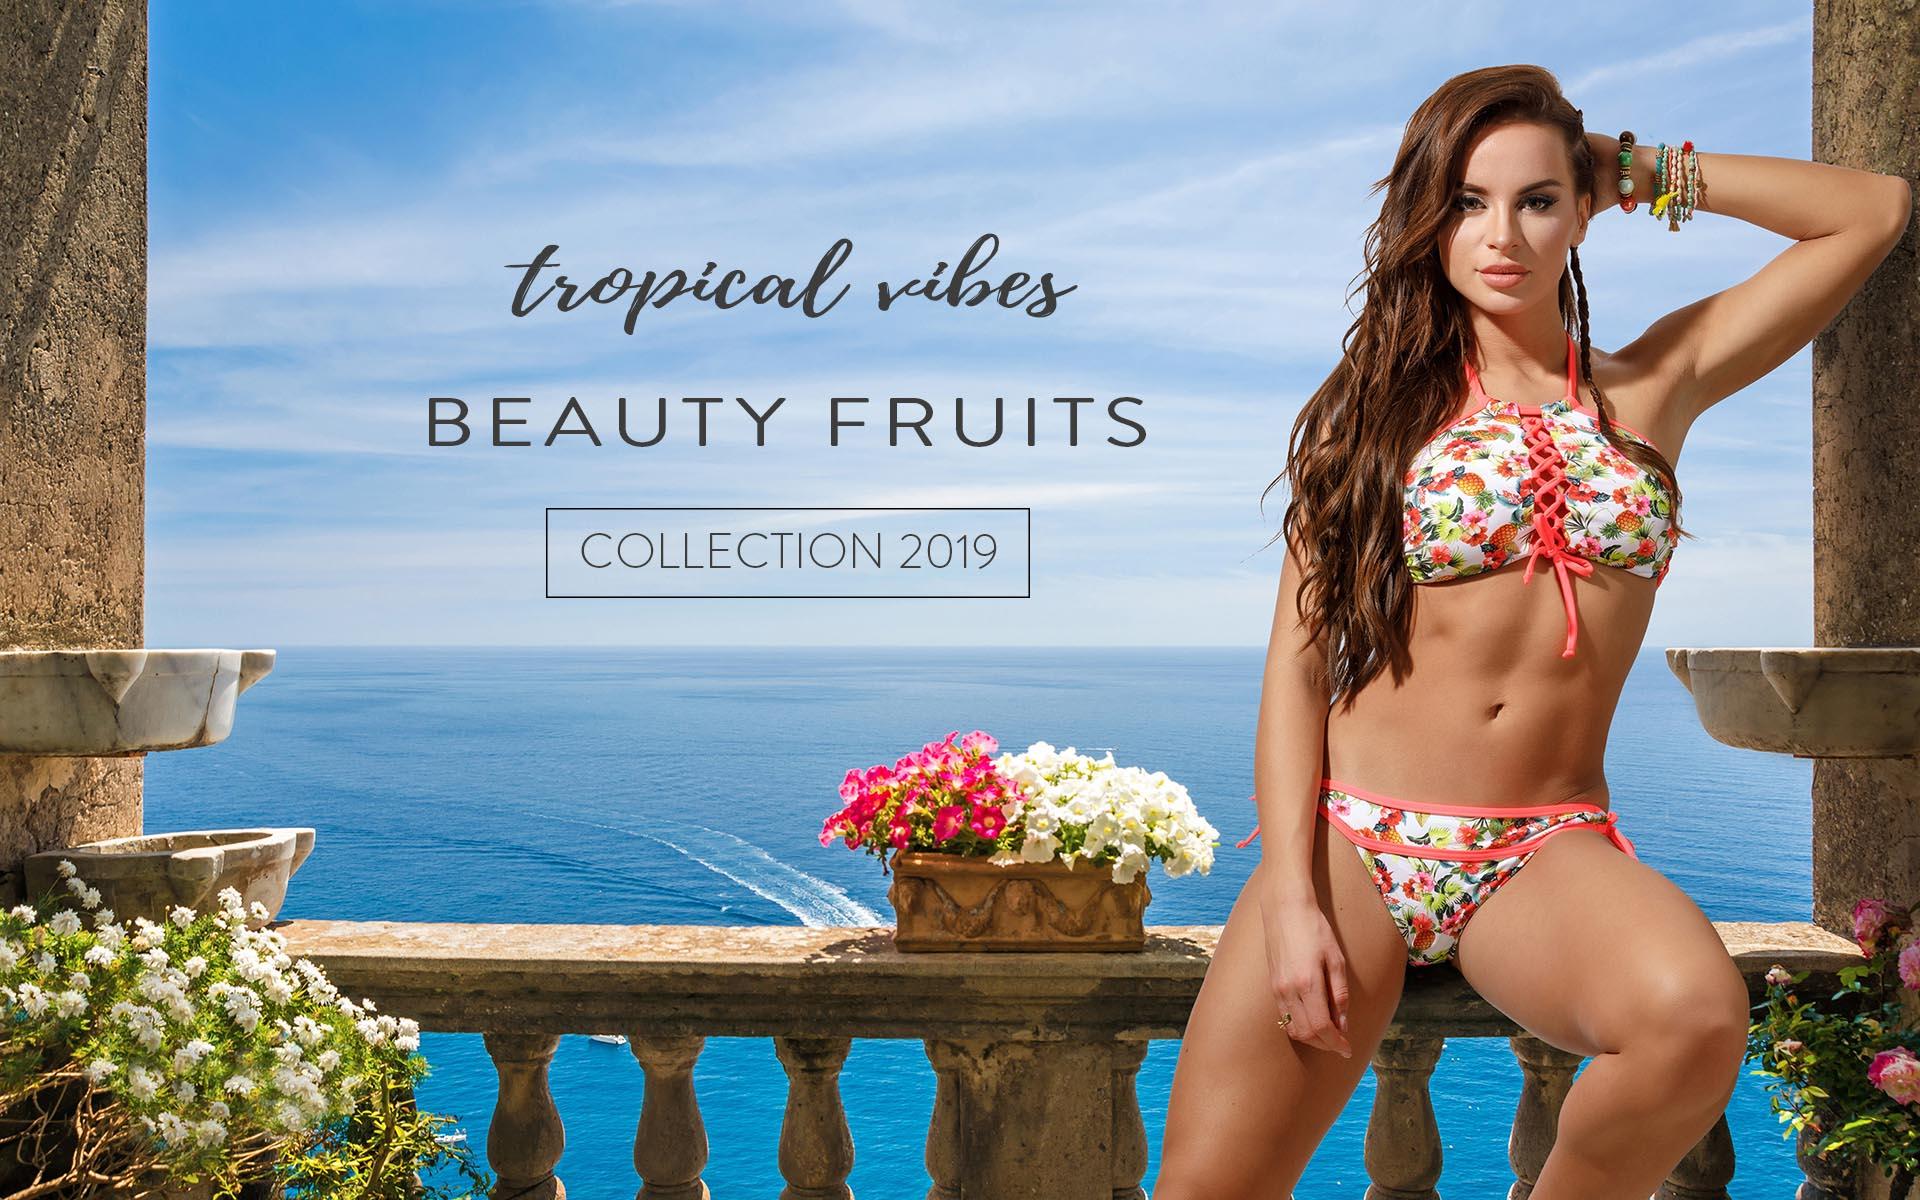 carib-furdoruha-bikini-2019-kollekcio-web-1n